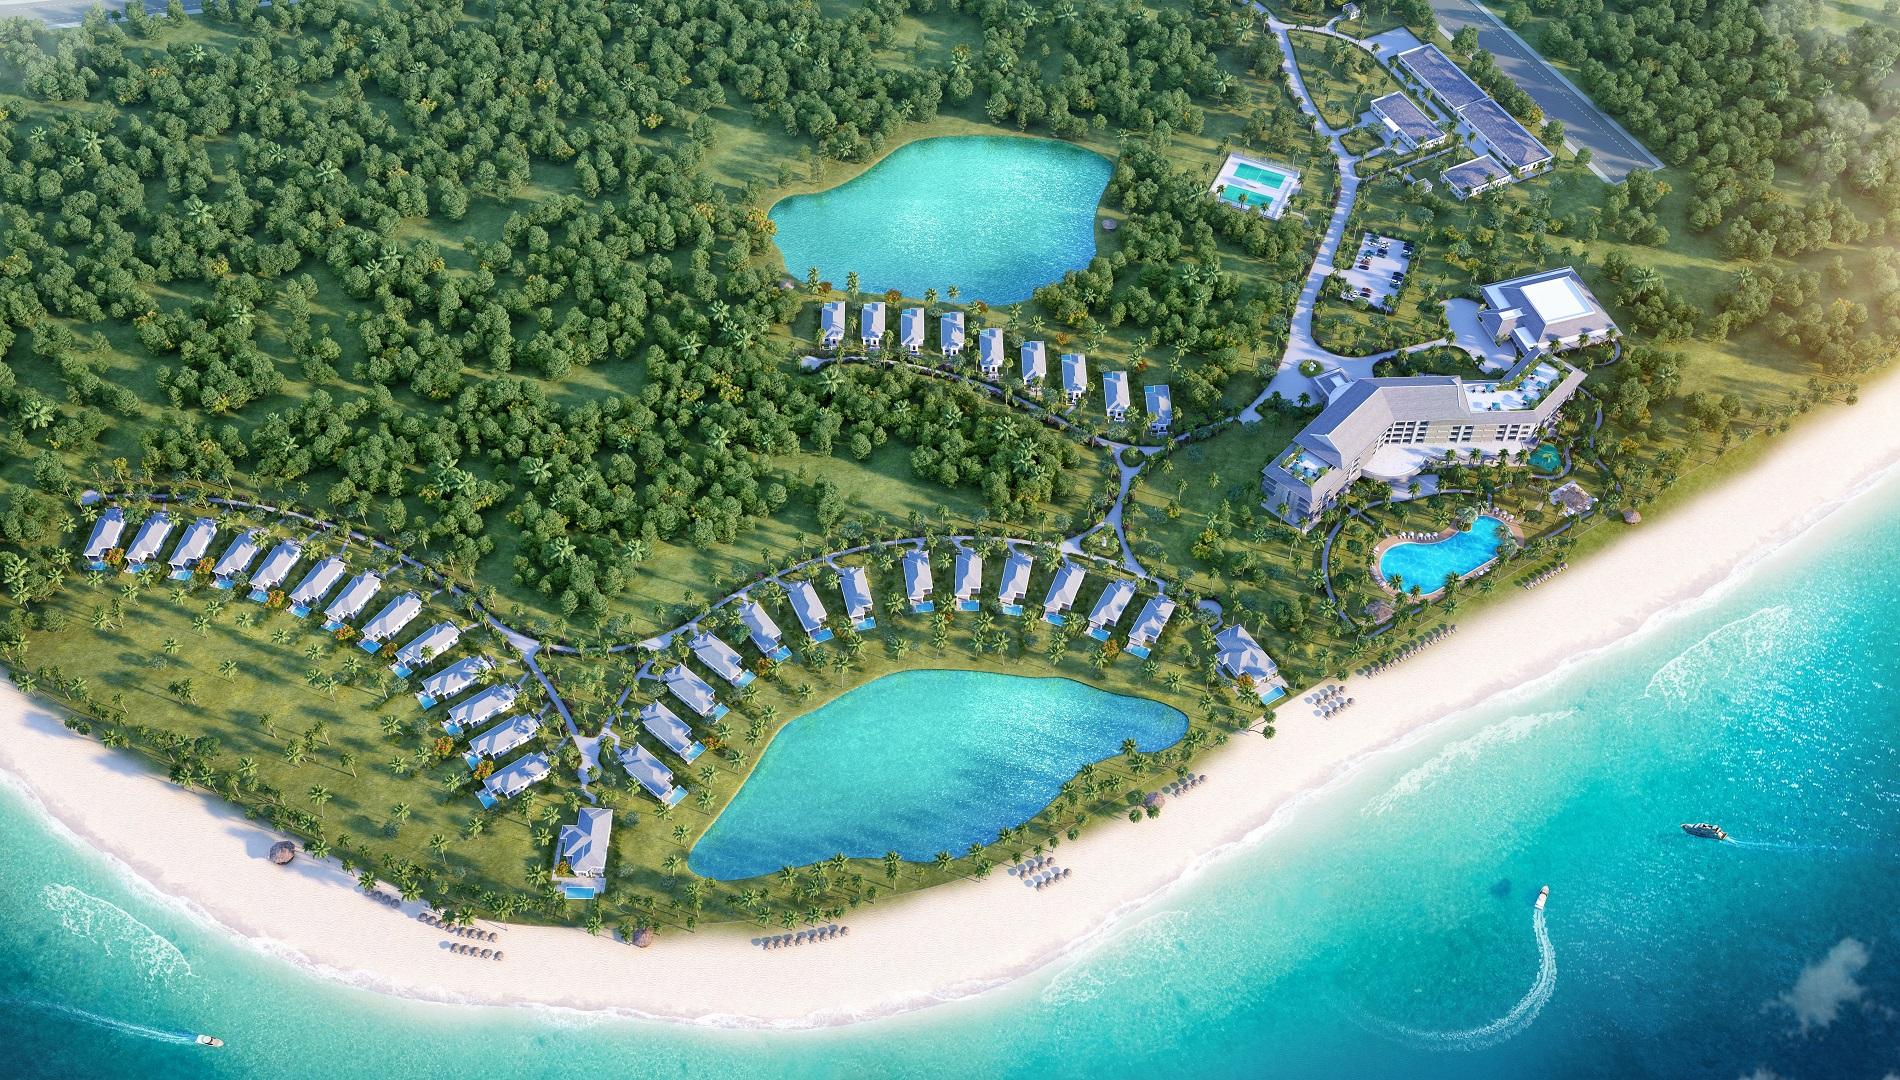 vinpearl-cua-hoi-resort-nghe-an